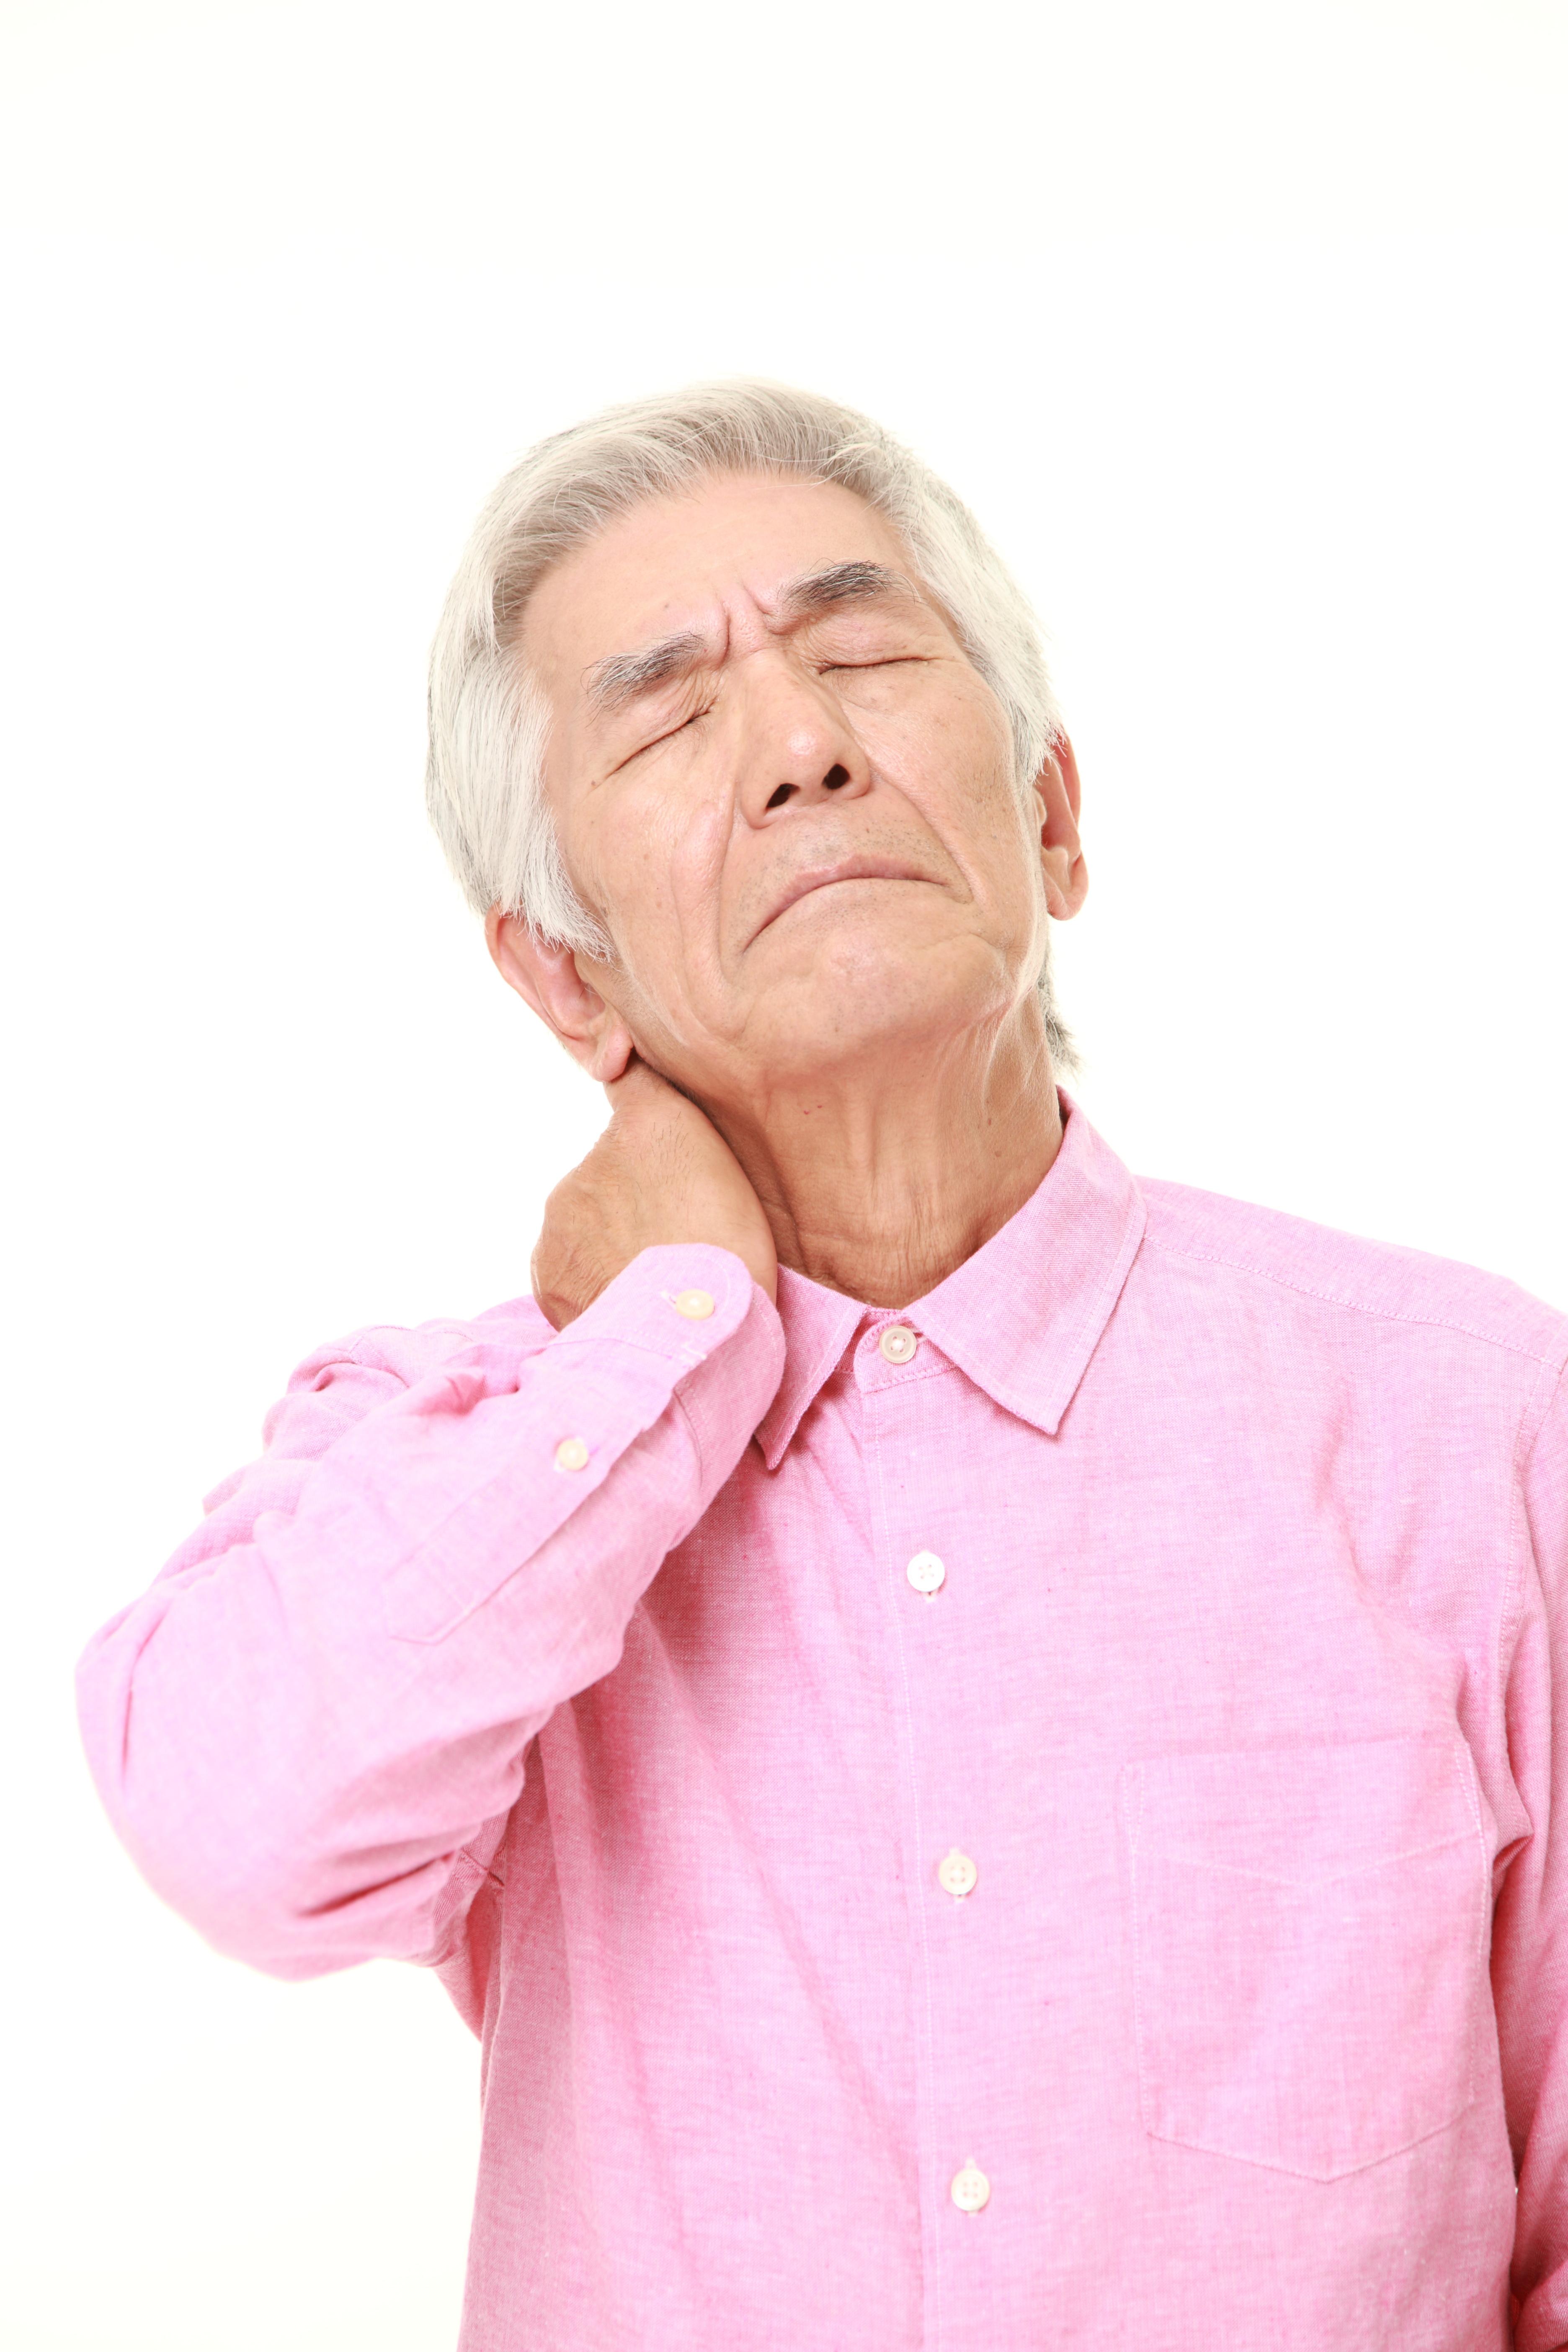 Artrite cervicali